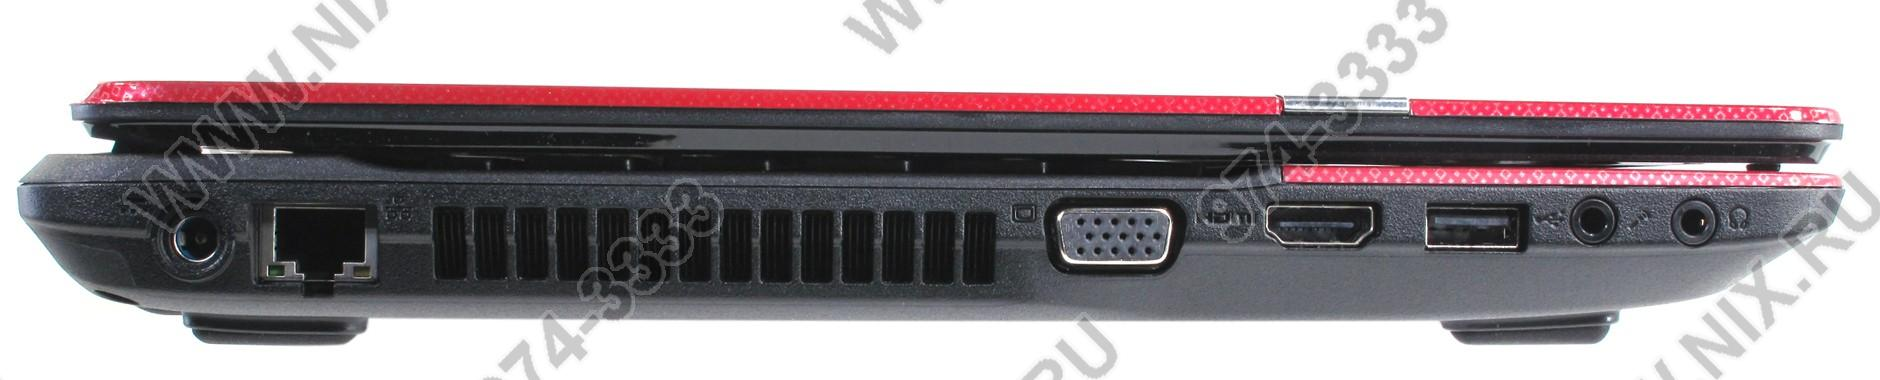 Ntb packardbell easynote tv44hc-53214g75mnwb i5-3210m, 4gb, 750gb, 15,6, dvd=r / rw, nvidia gt 630m, 2gb